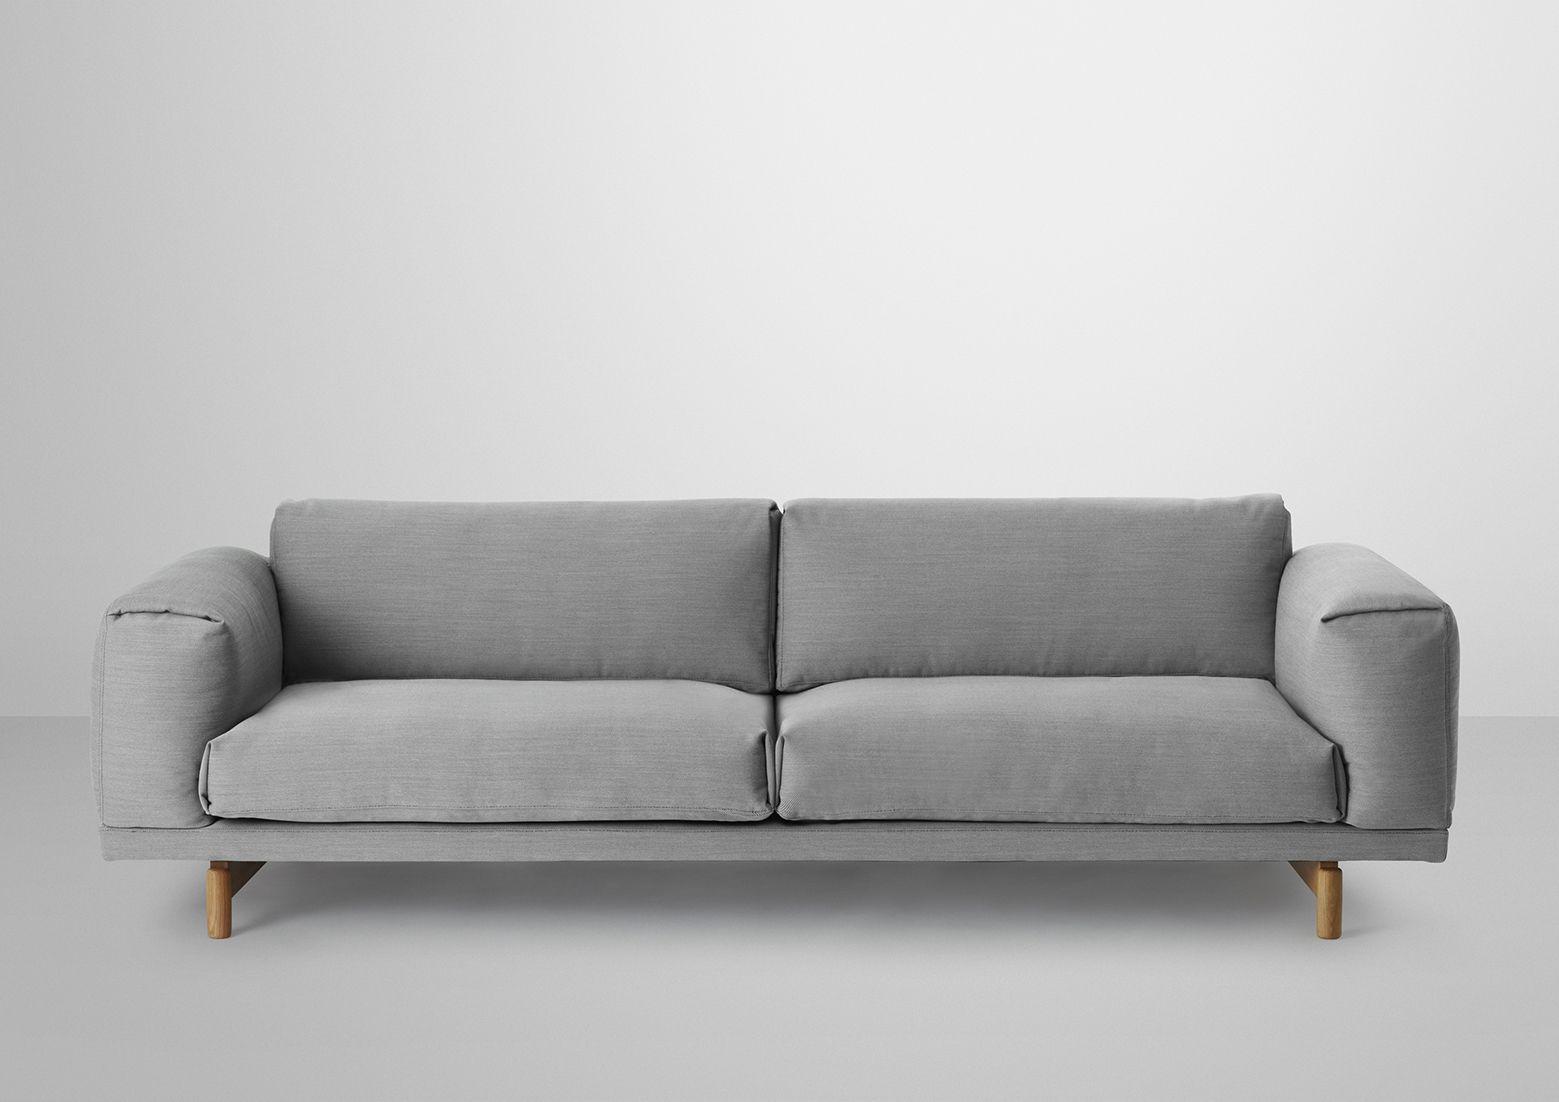 Elegant Rest / Design By Anderssen U0026 Voll / Muuto